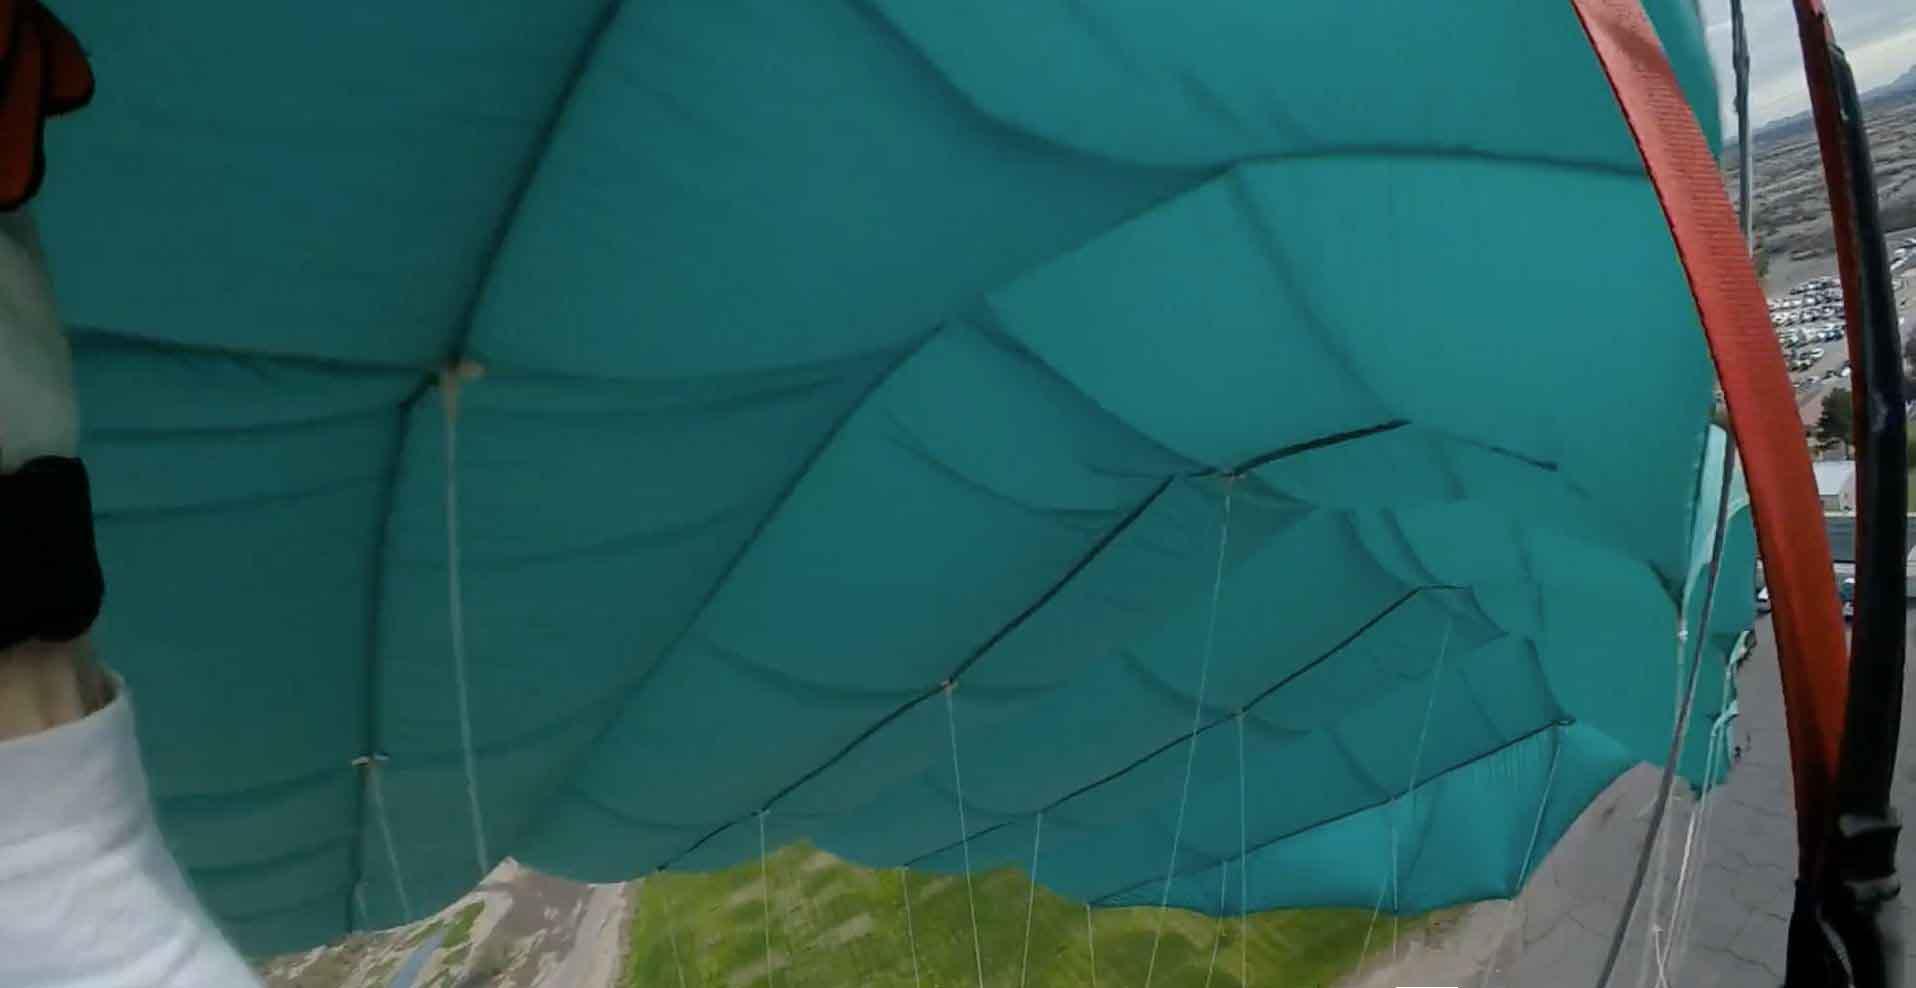 Canopy collision